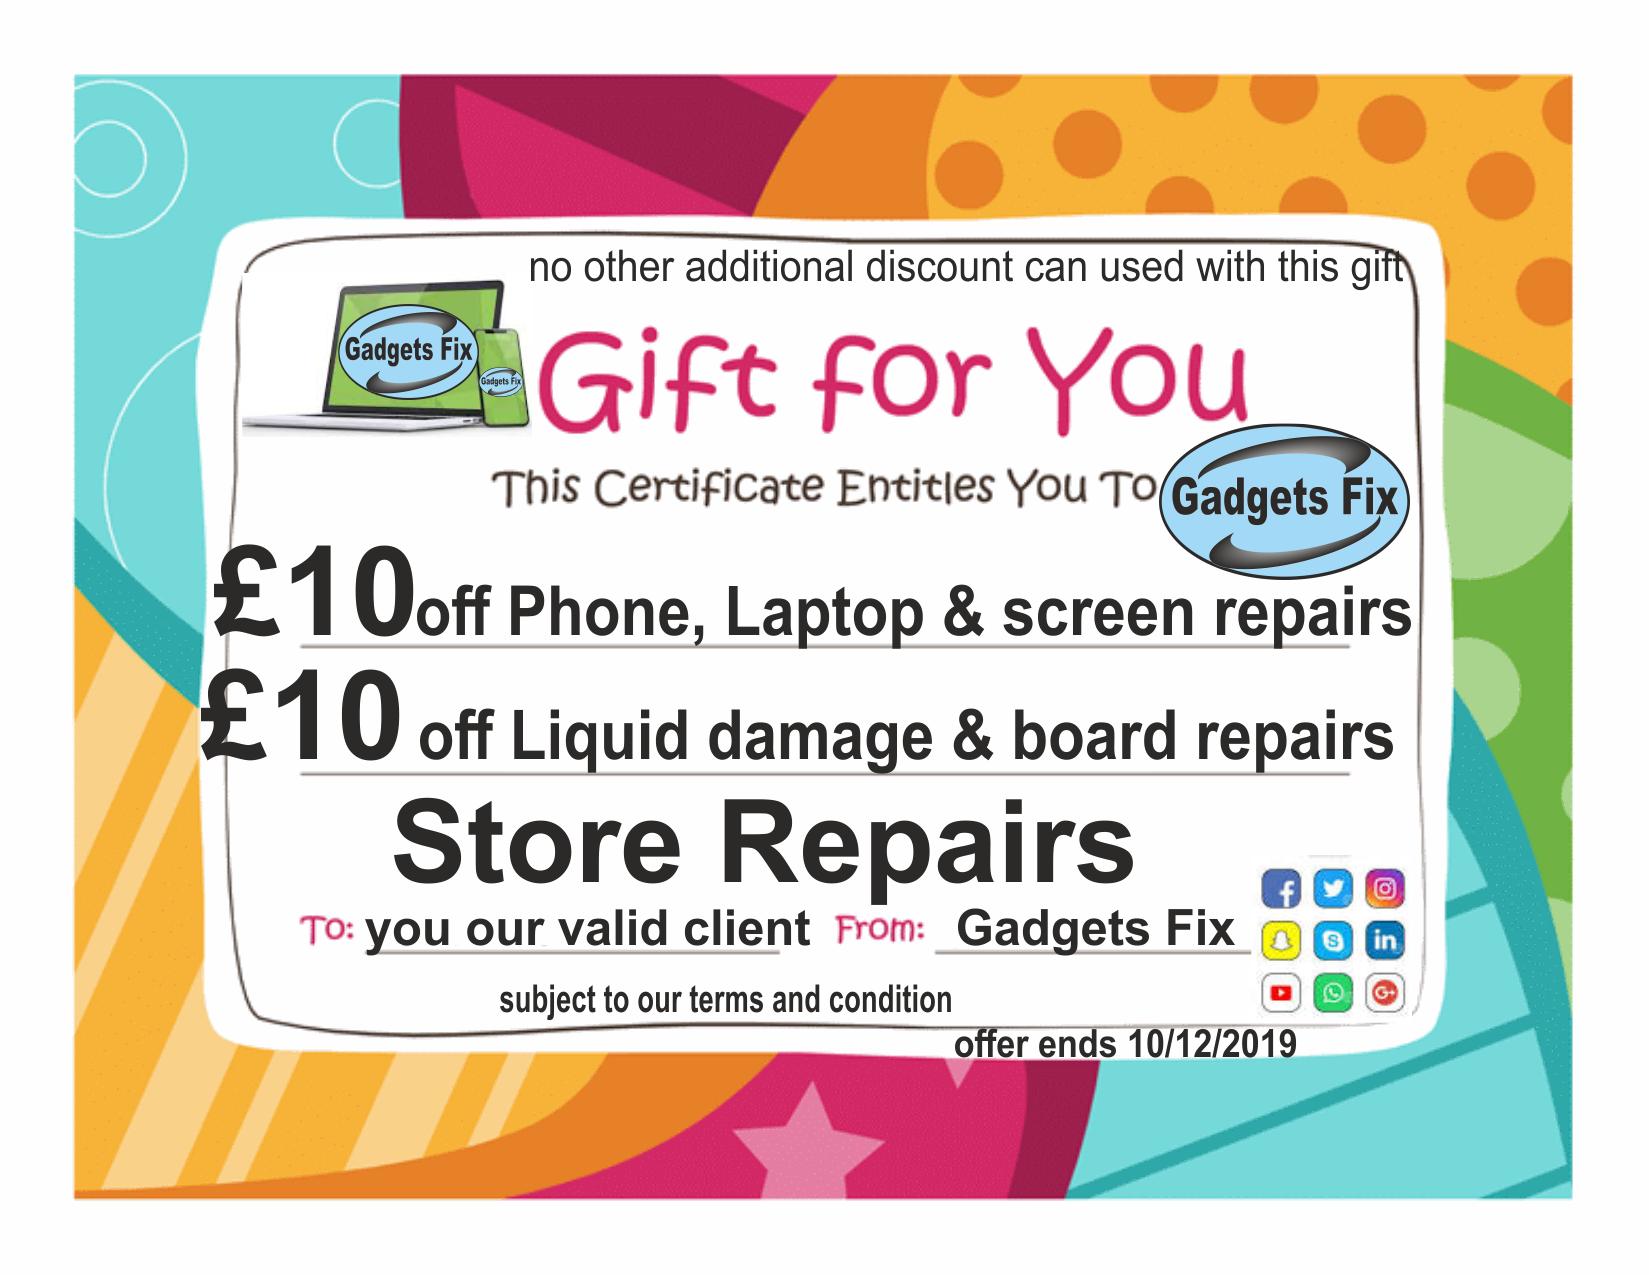 voucher discount Gadgetsfix.com for laptop and phone screen repairs